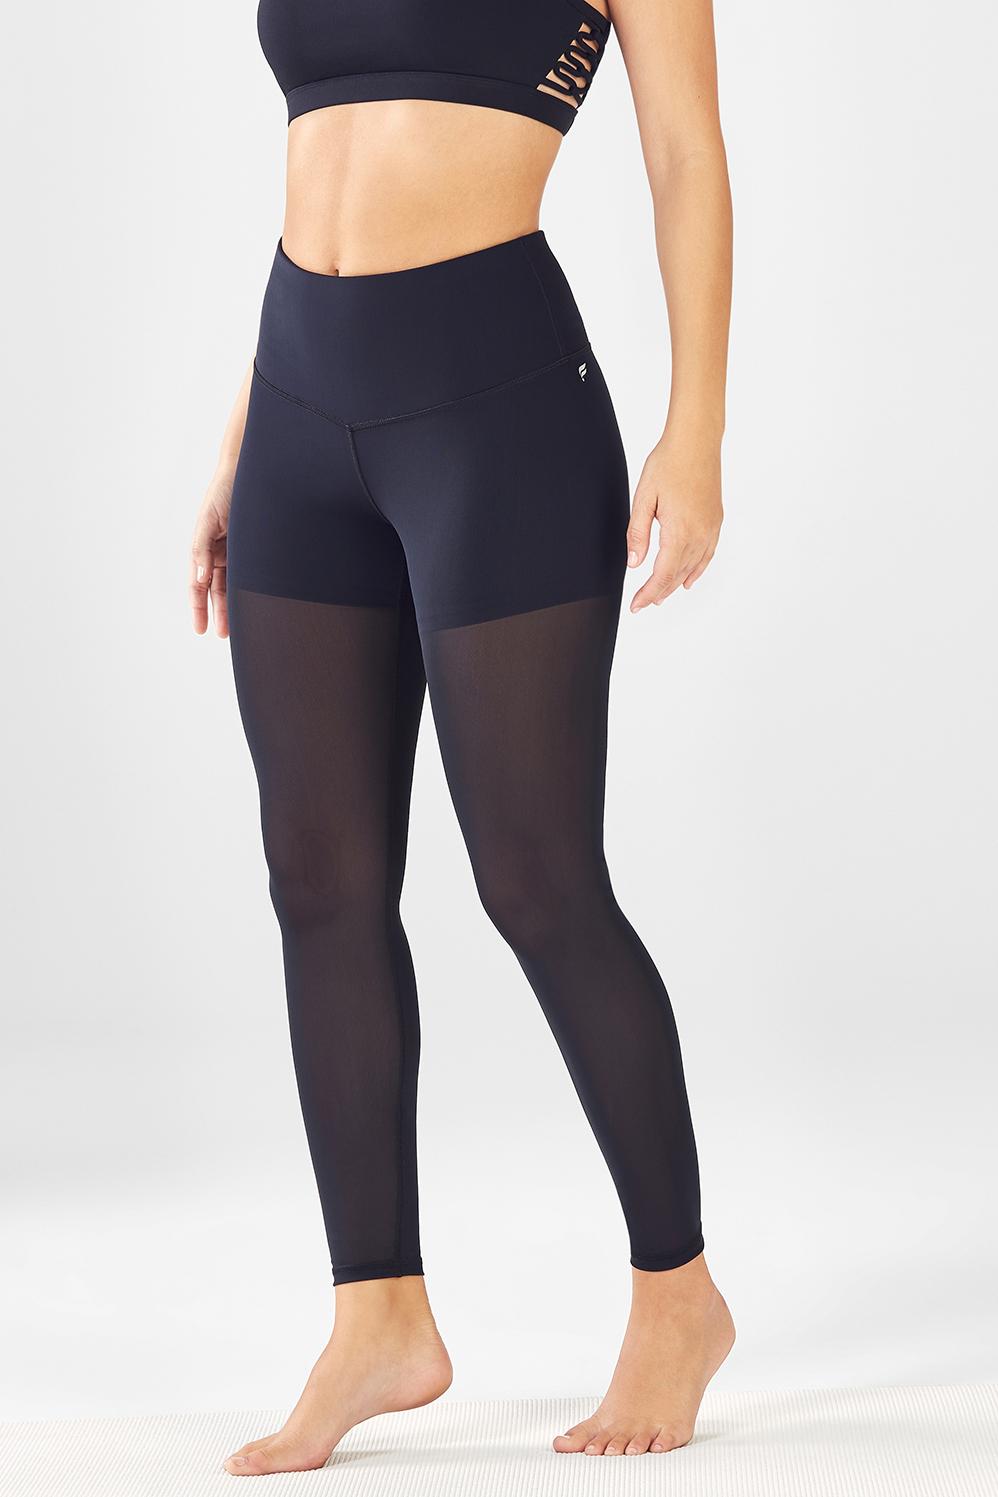 33077aaf4bb72 High-Waisted Mesh PureLuxe Legging - Fabletics